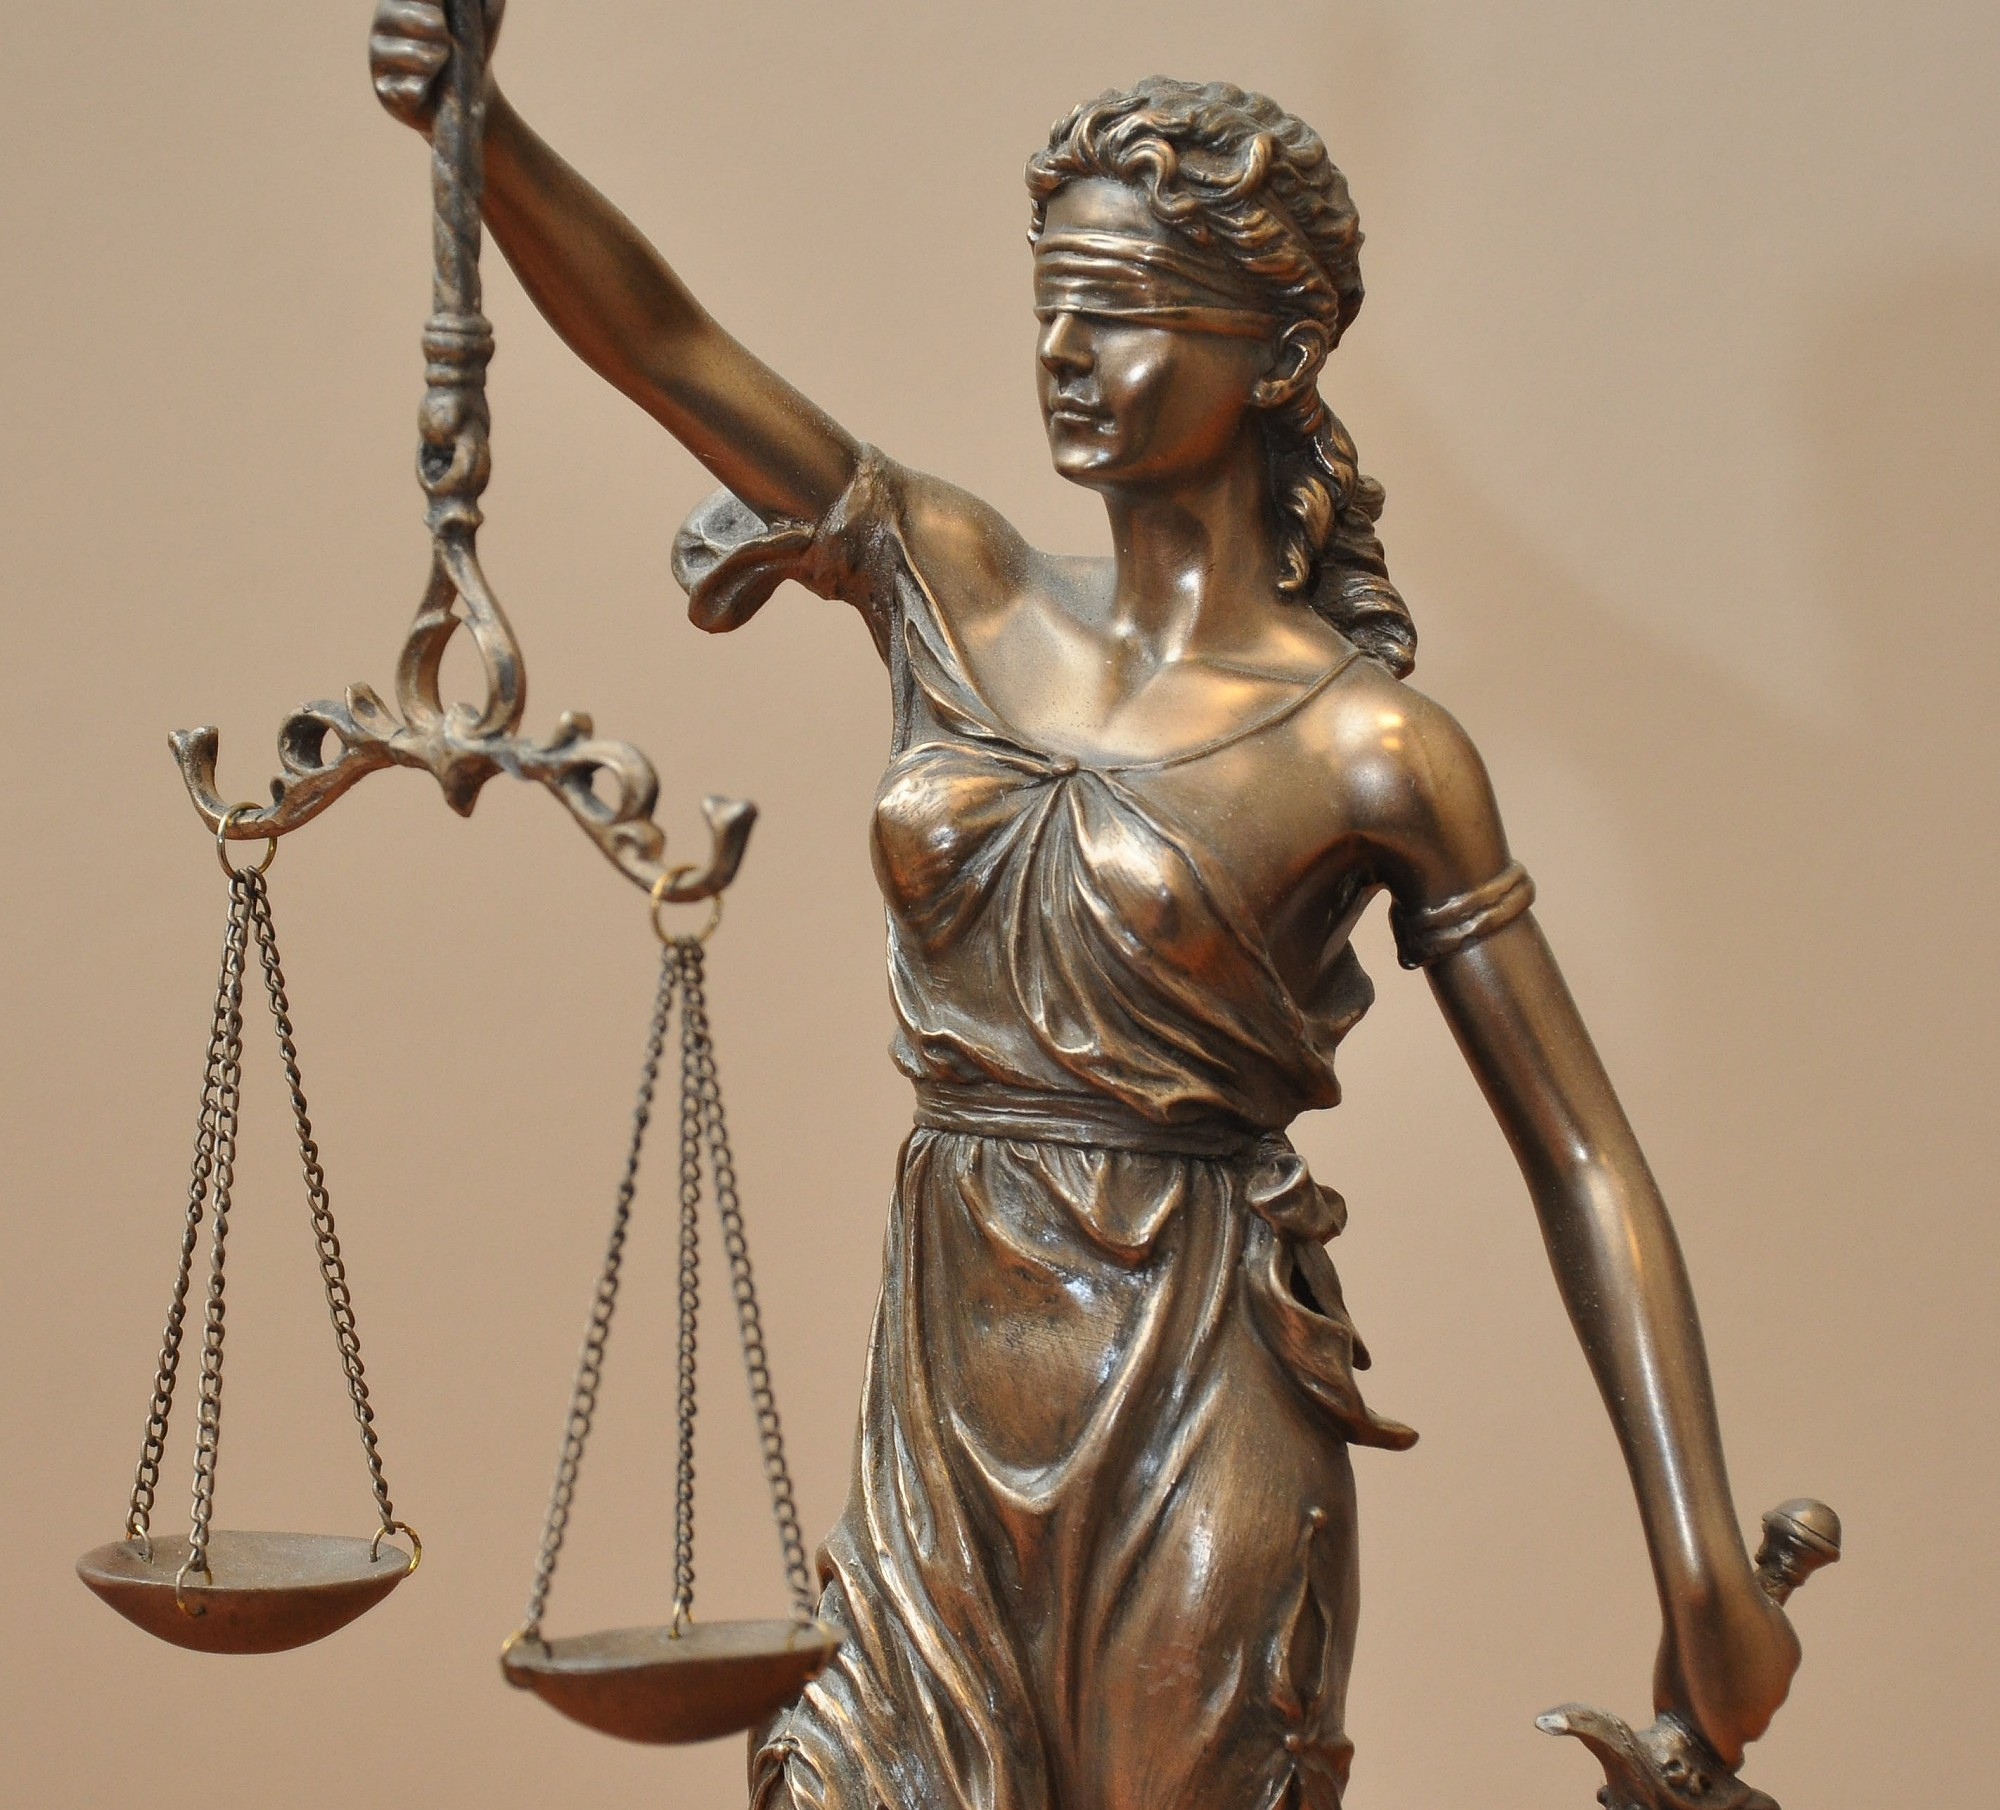 За избиение младенца – более суровое наказание